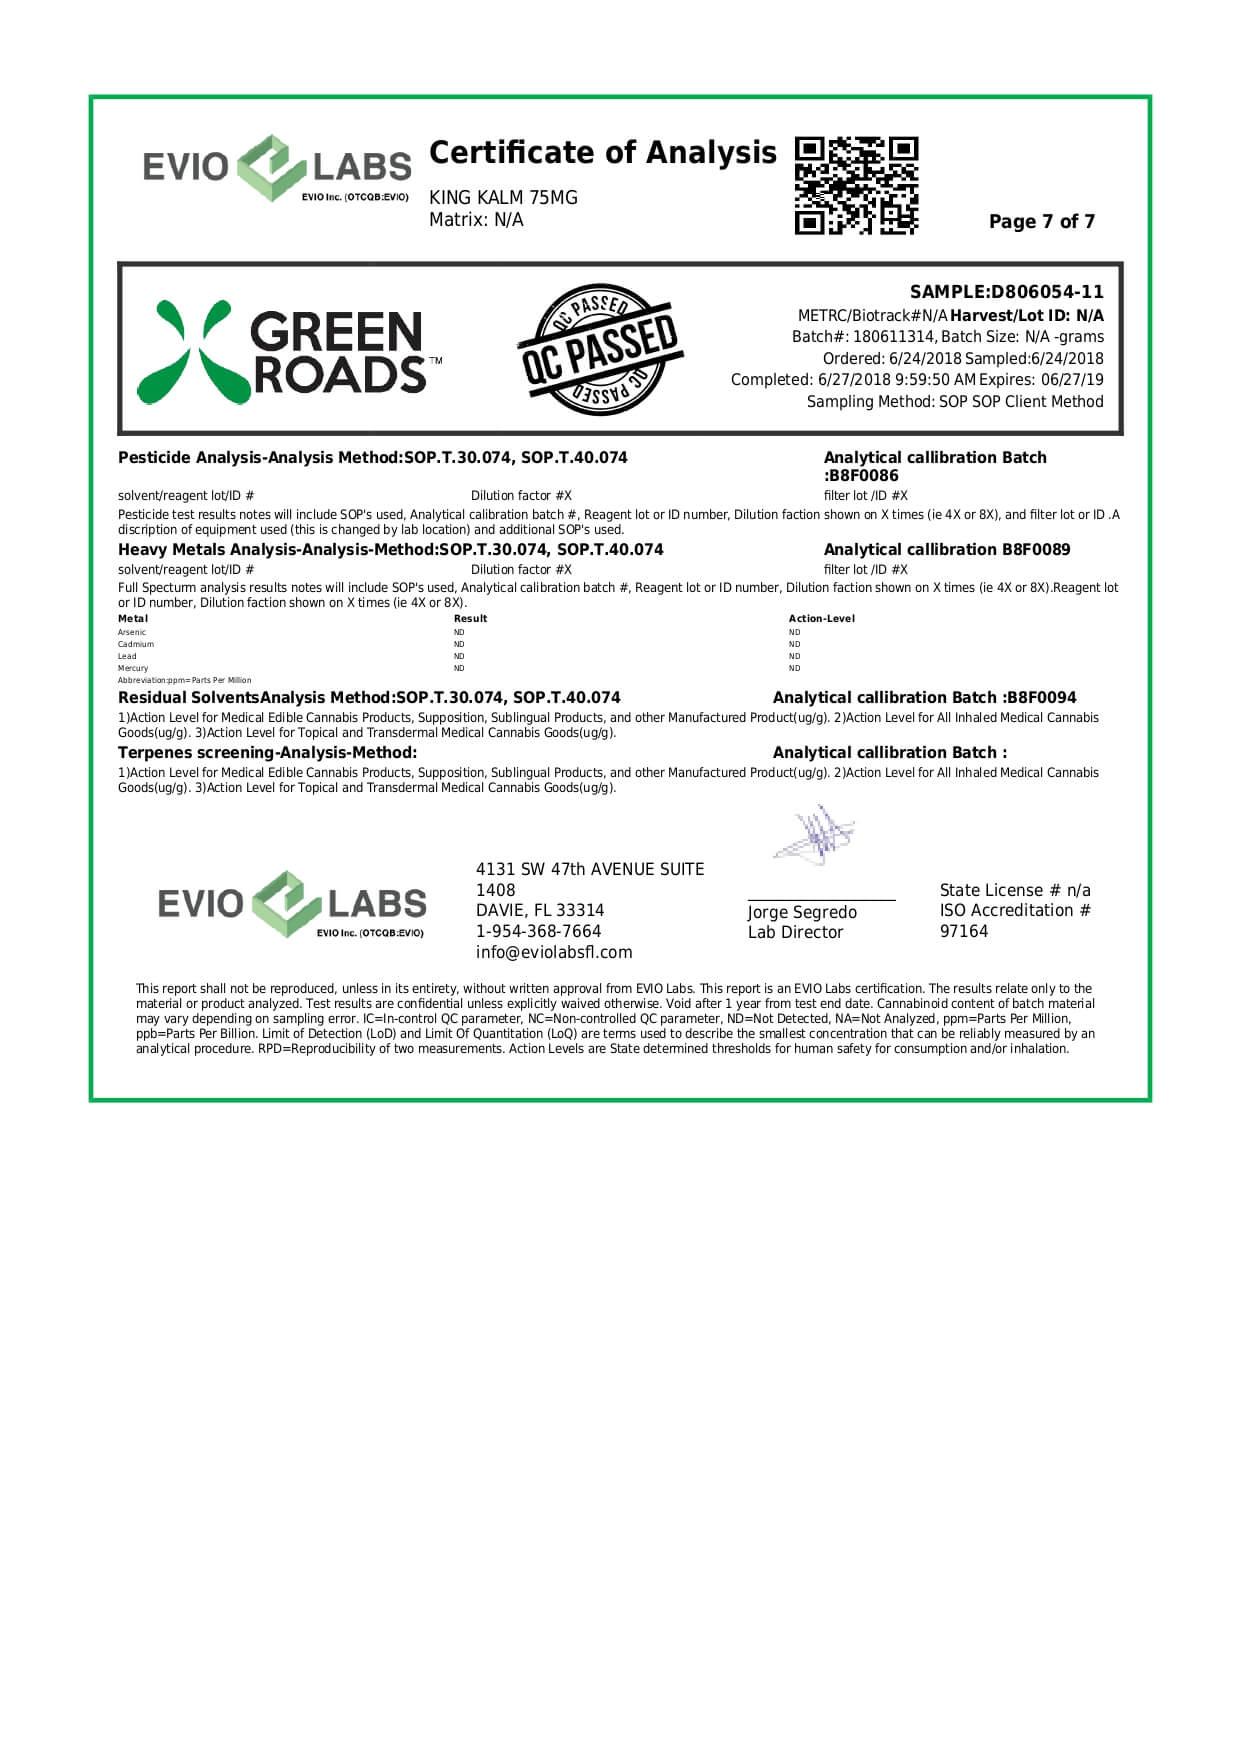 Green Roads CBD Pet Tincture KingKalmCBD Canine Formula 75mg Lab Report